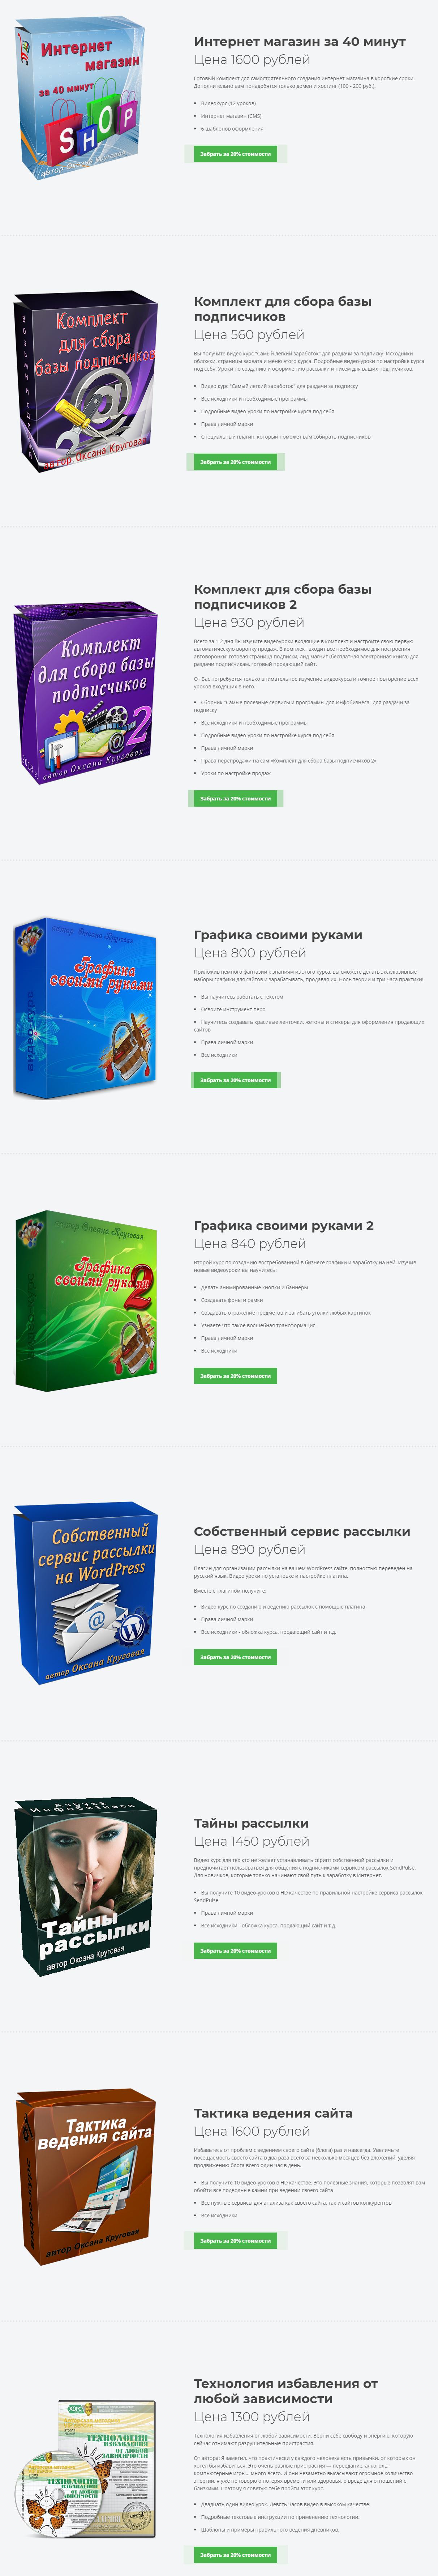 screenshot-biz-nabor.ru-2021-01-01-02-05-49-864.png